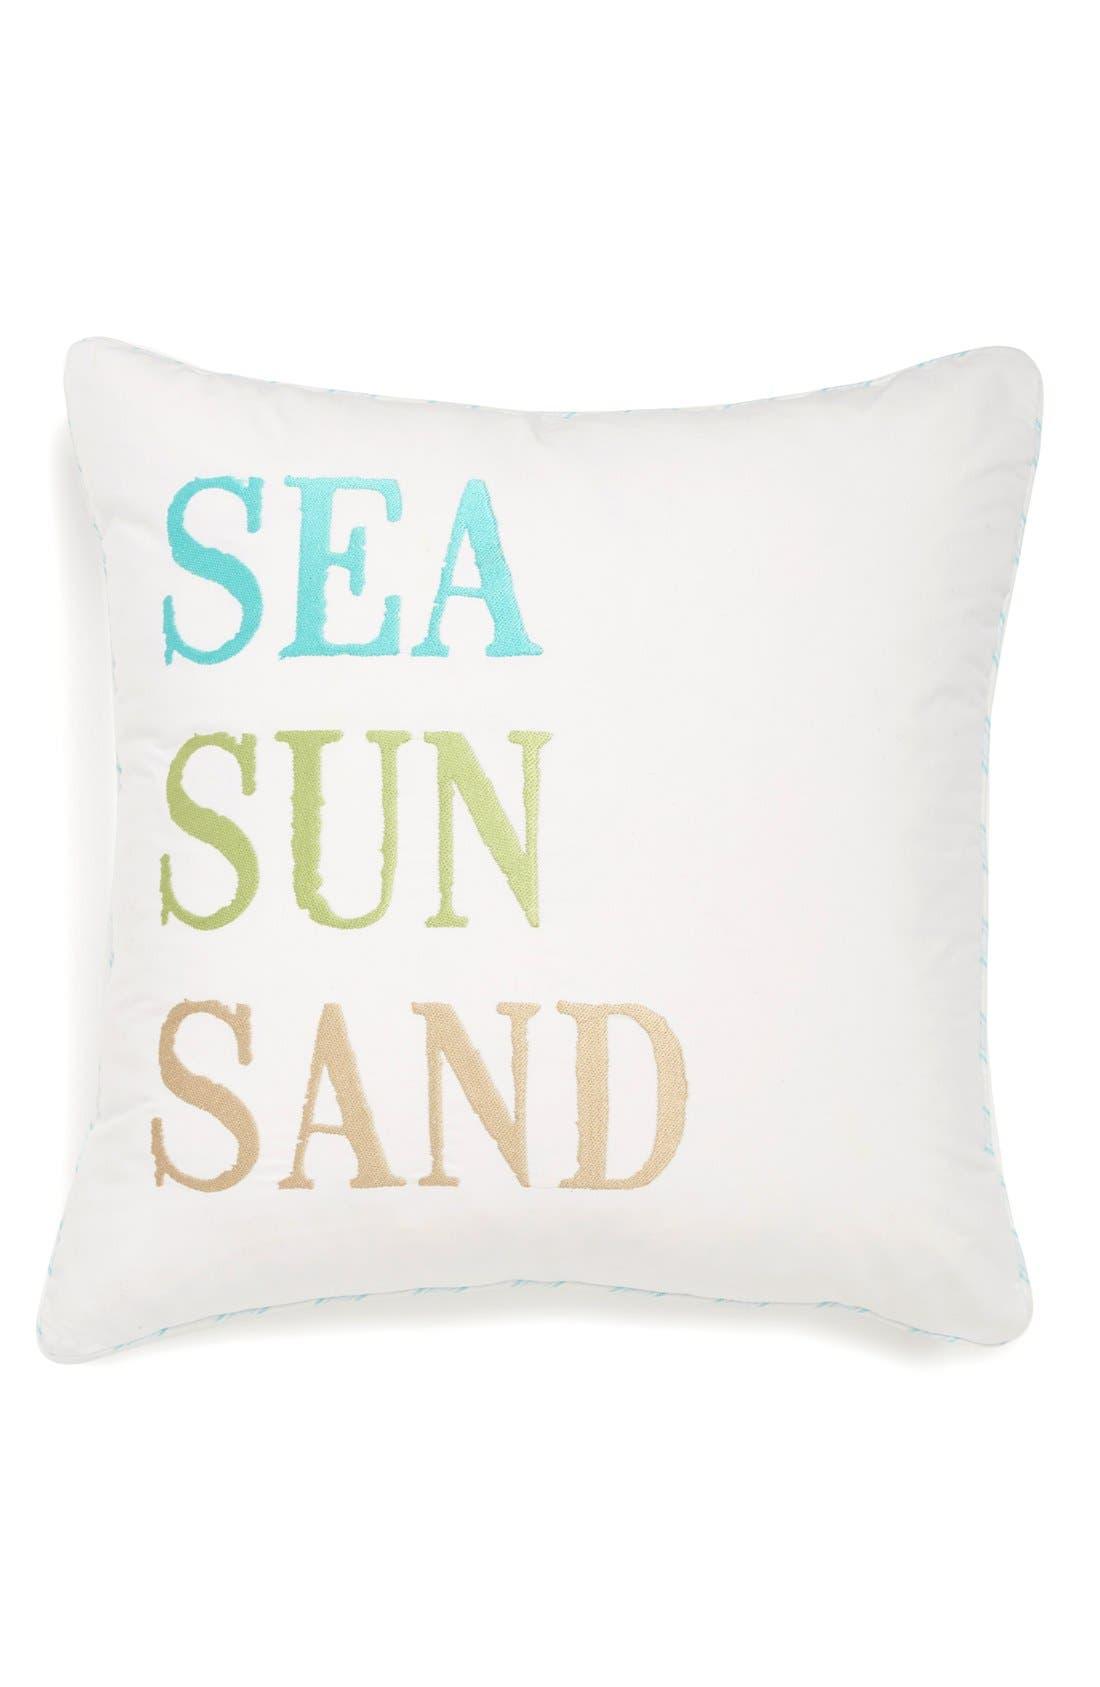 Main Image - Levtex 'Sea, Sun, Sand' Pillow